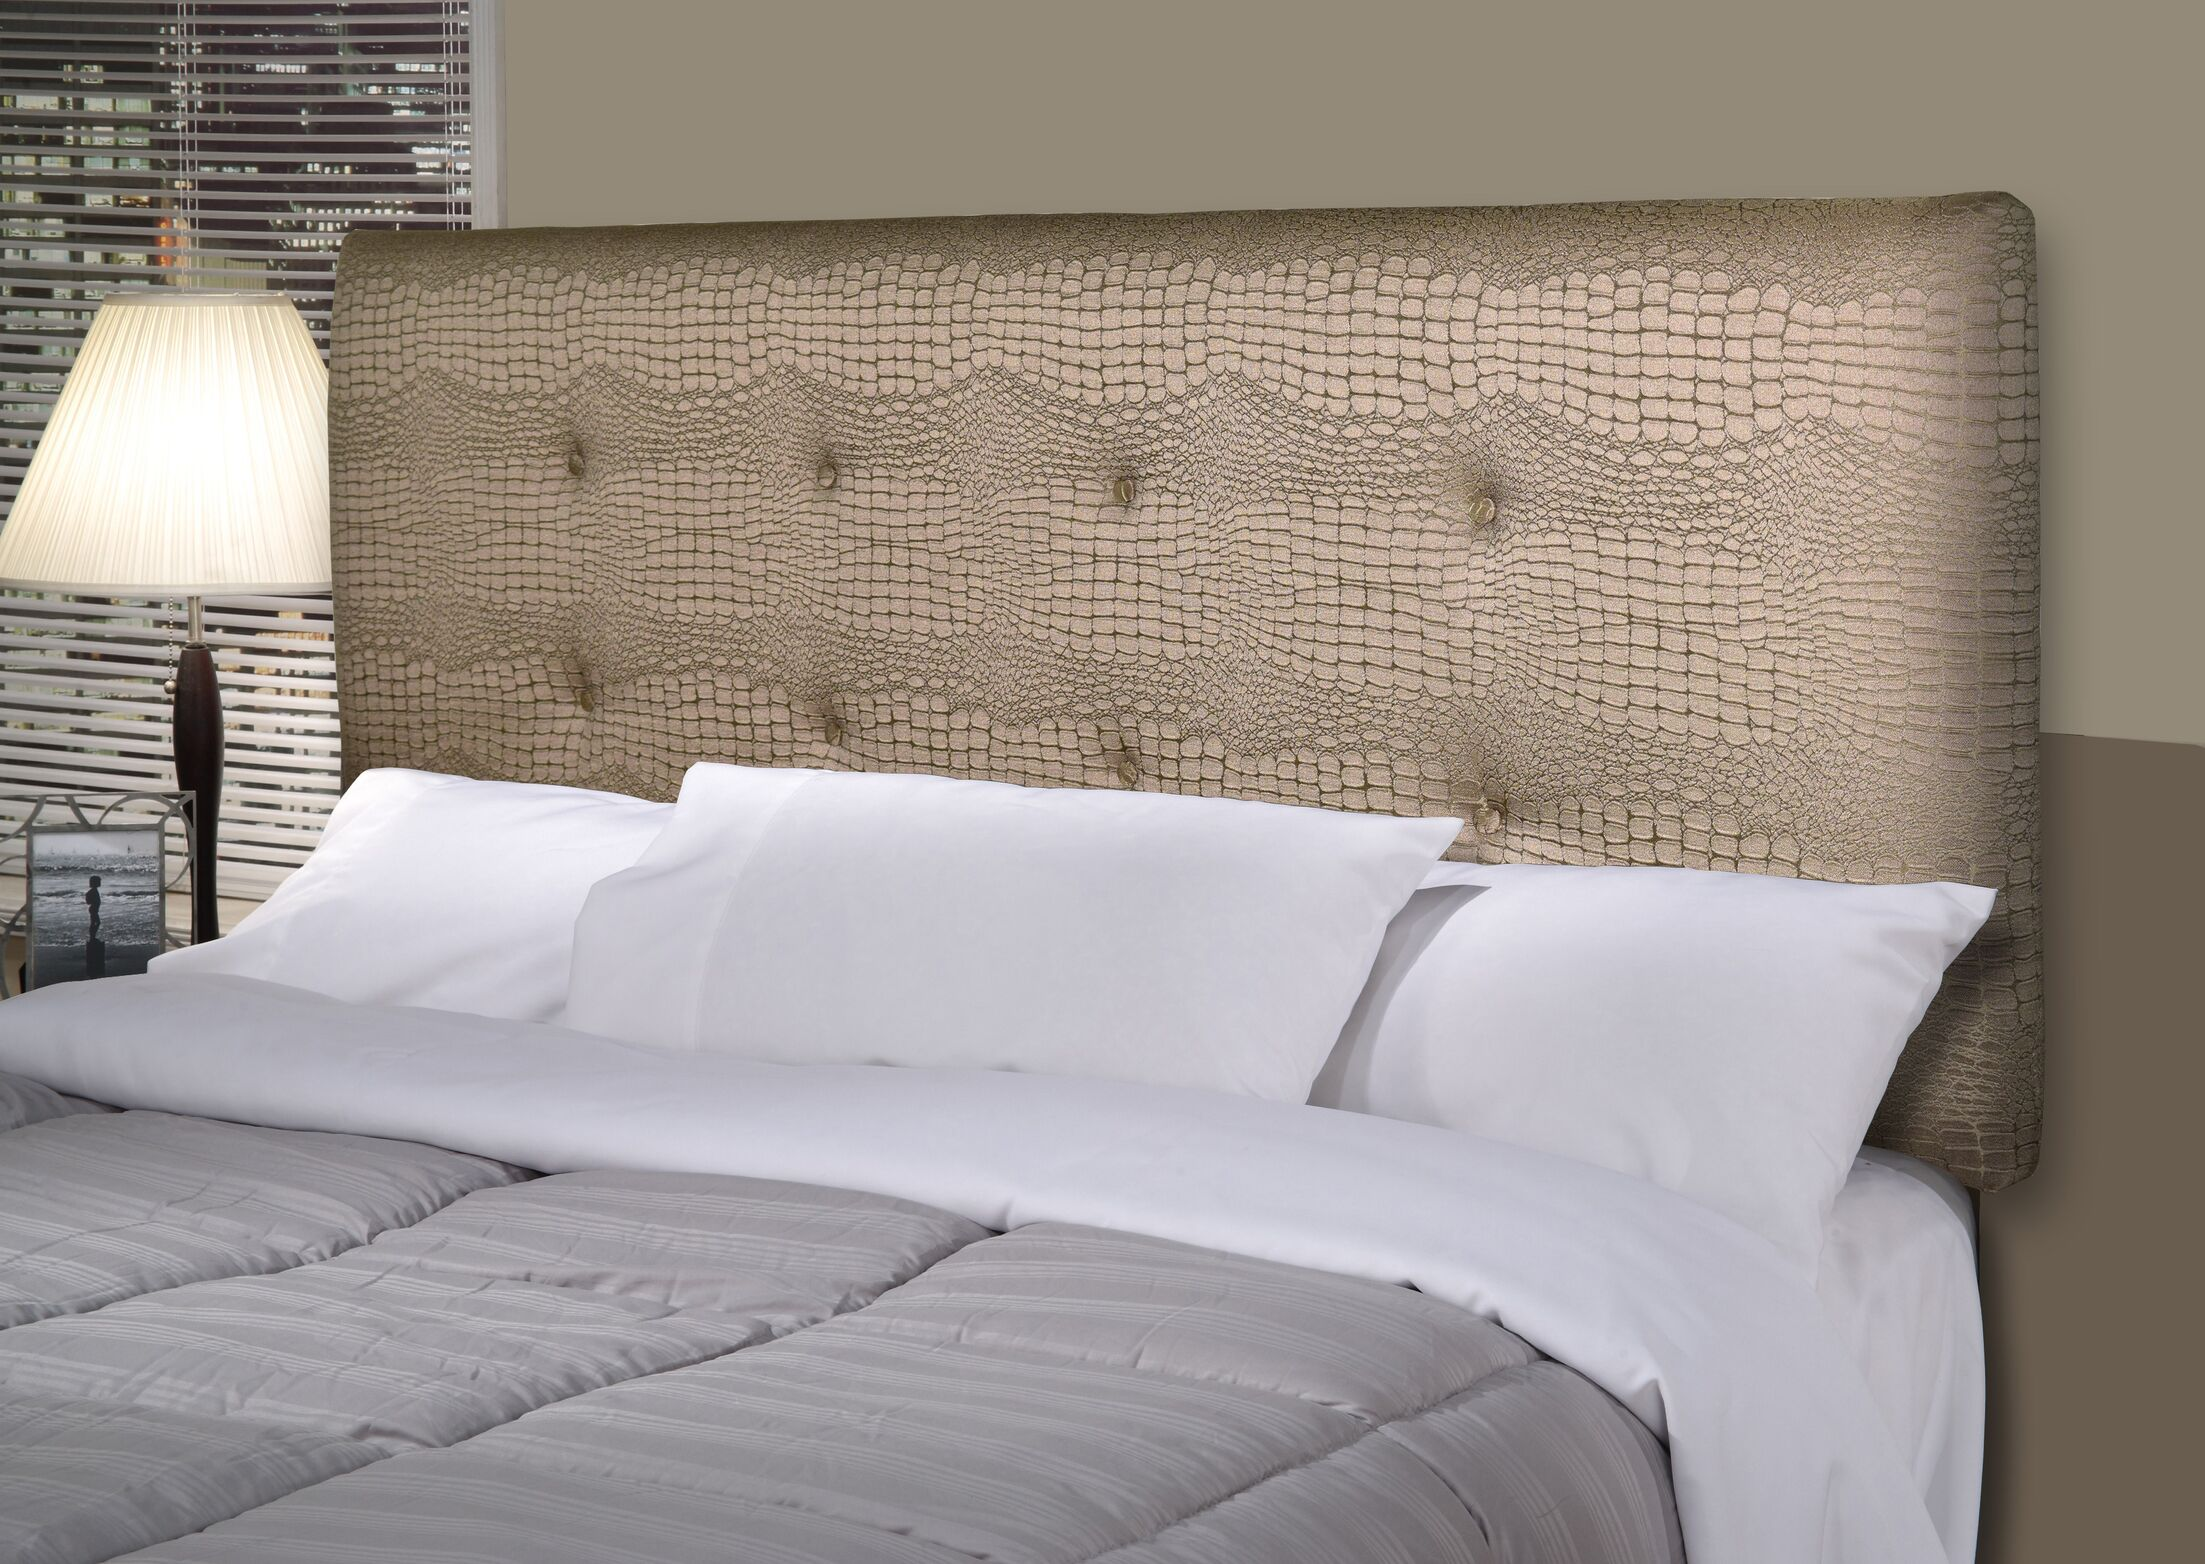 Tillie Ali Upholstered Panel Headboard Size: Queen, Upholstery: Silver